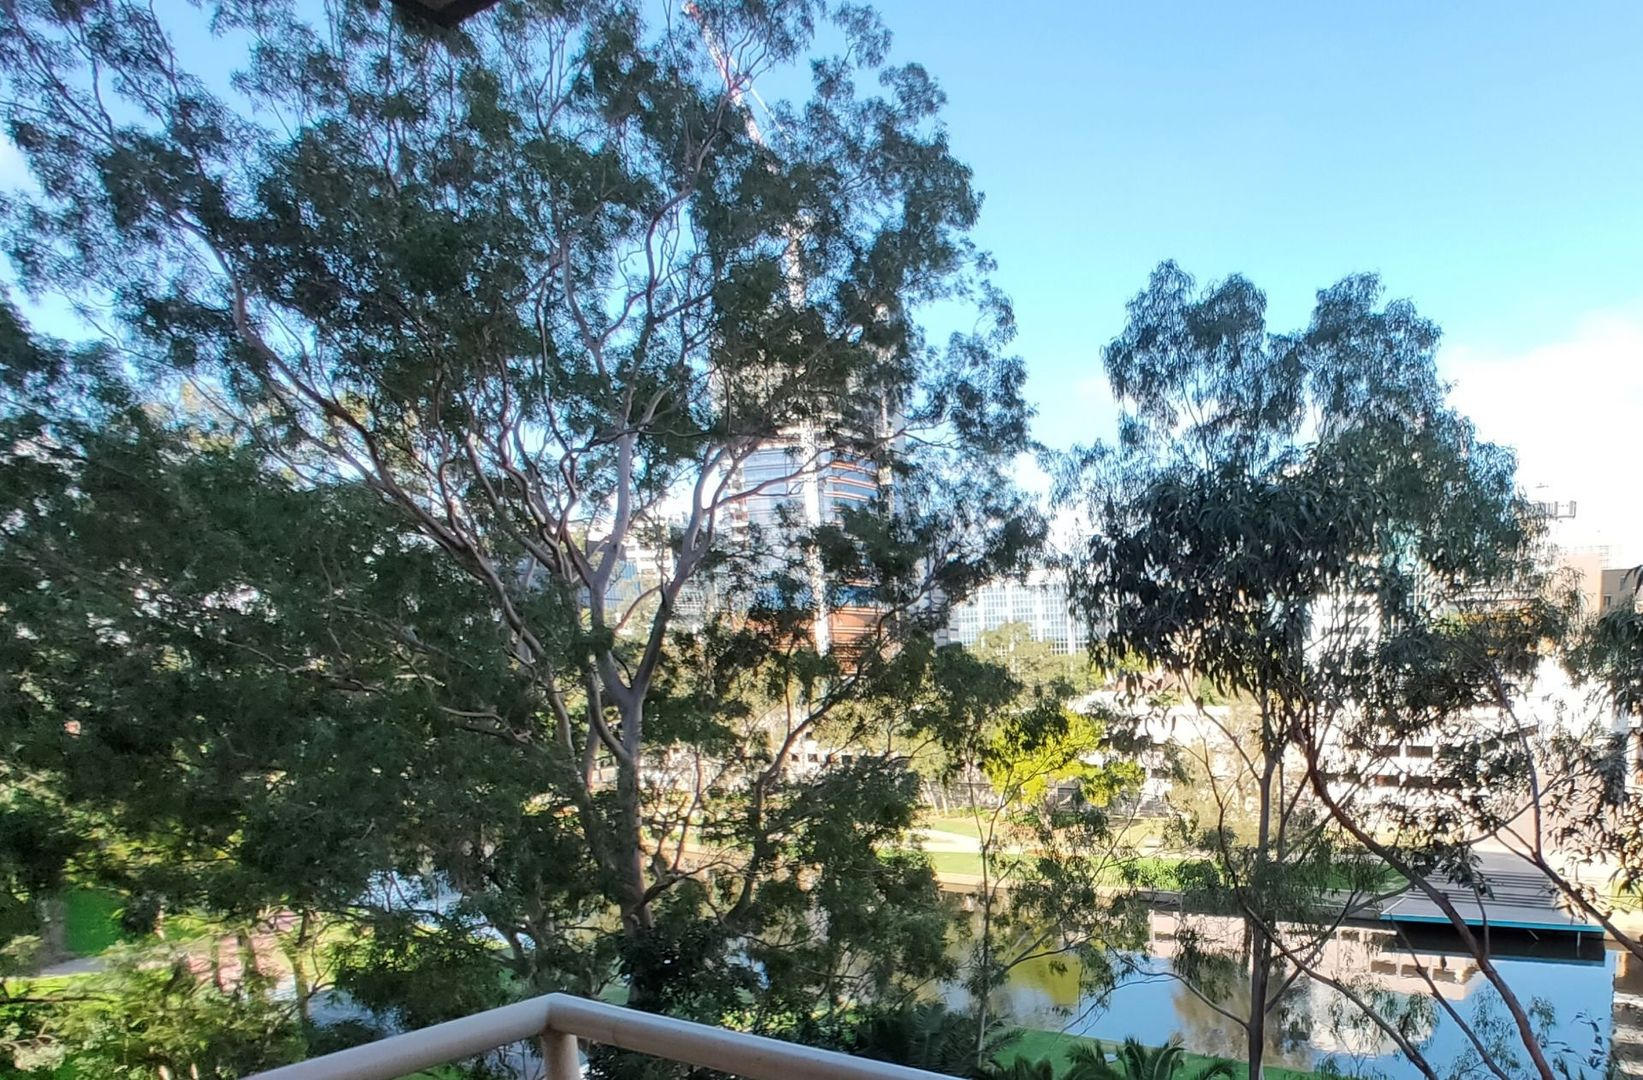 43/3 SORRELL STREET, Parramatta NSW 2150, Image 0